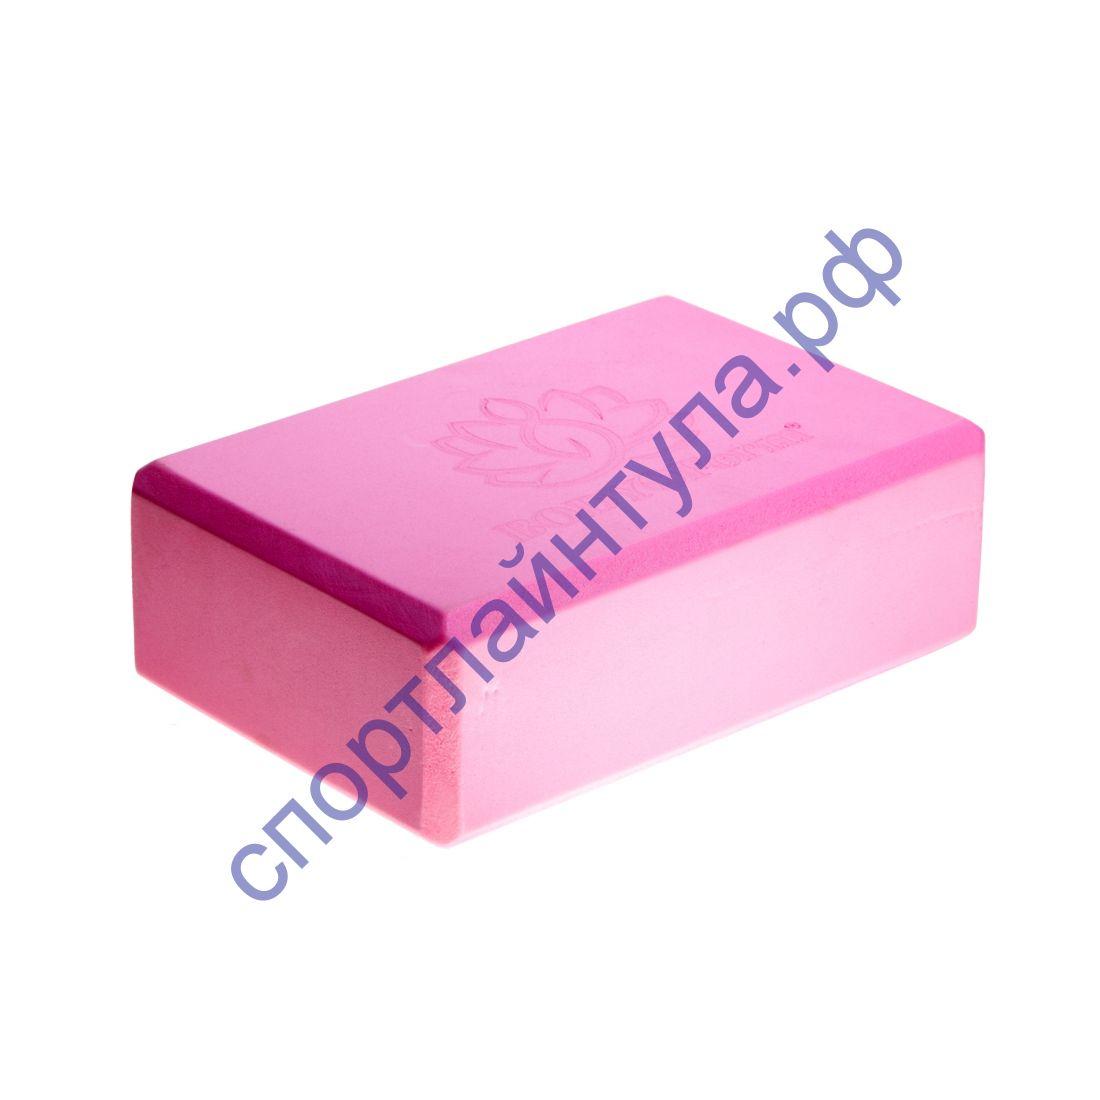 Блок для йоги BF-YB02 pink